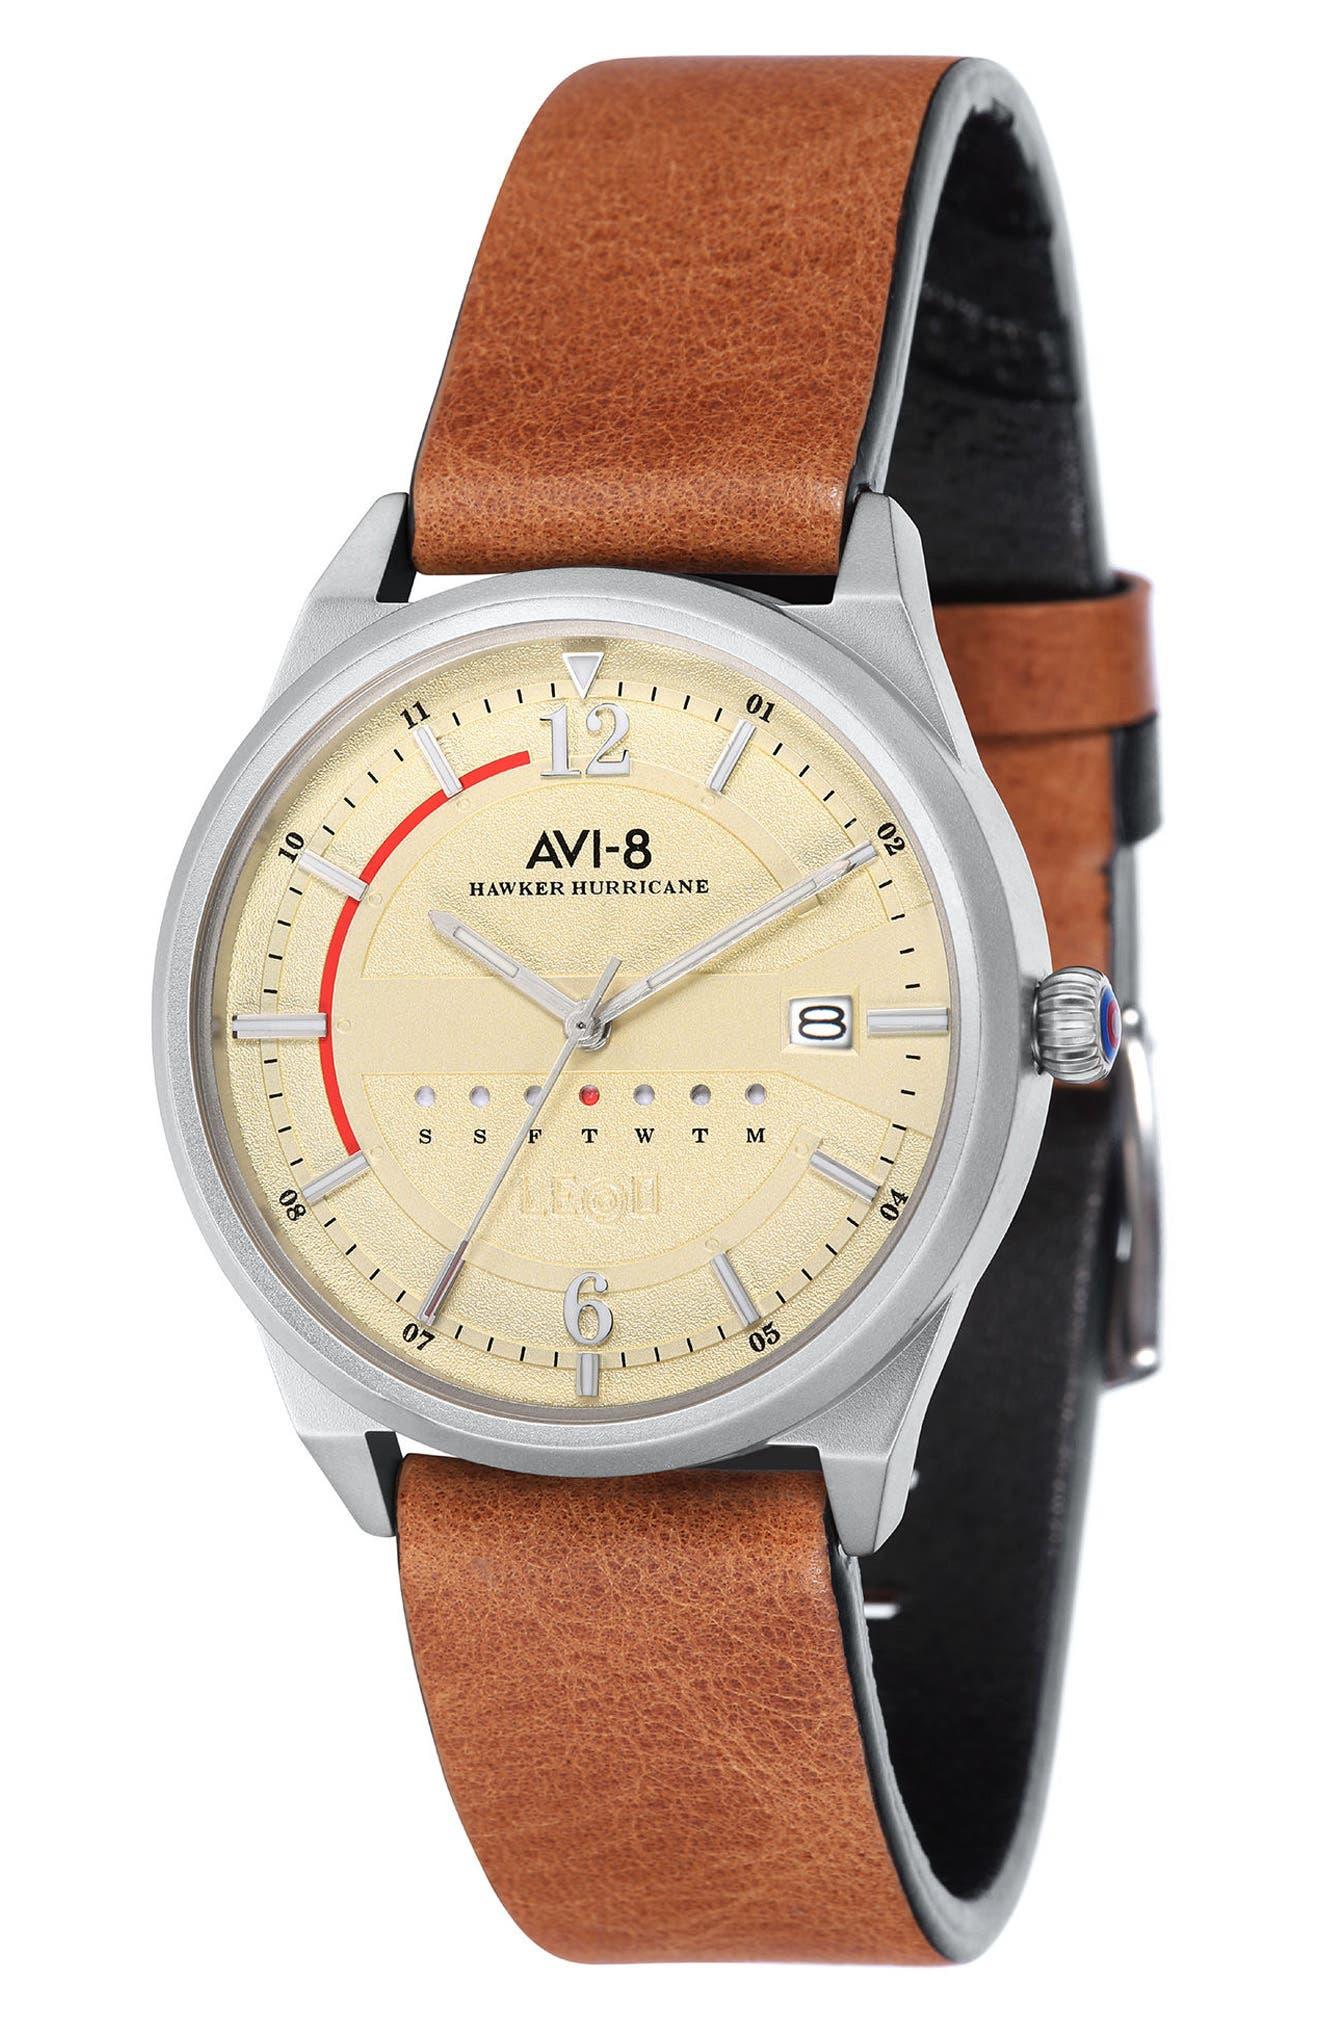 Main Image - AVI-8 Hawker Hurricane Leather Strap Watch, 38mm